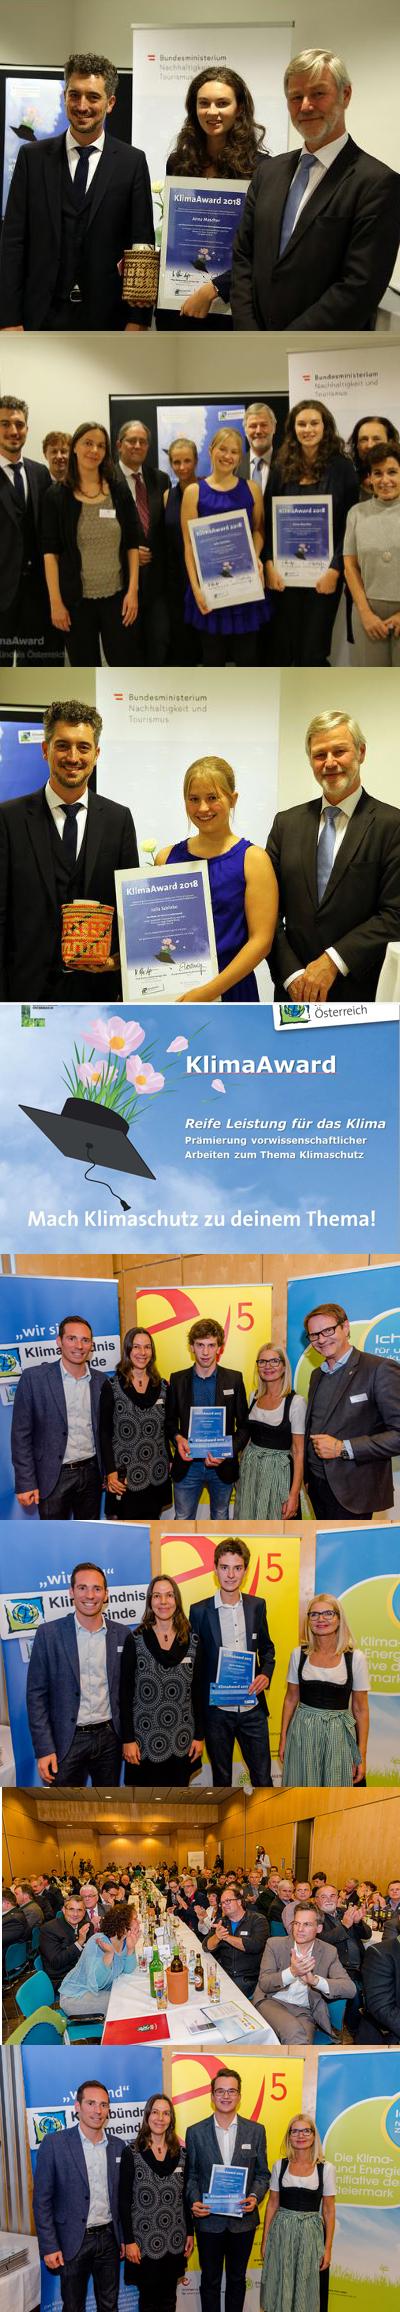 Fotos 1-5 KlimaAward 2018(c klimabündnis), Fotos 5-8 KlimaAward 2017 ( c www.spekner.at)